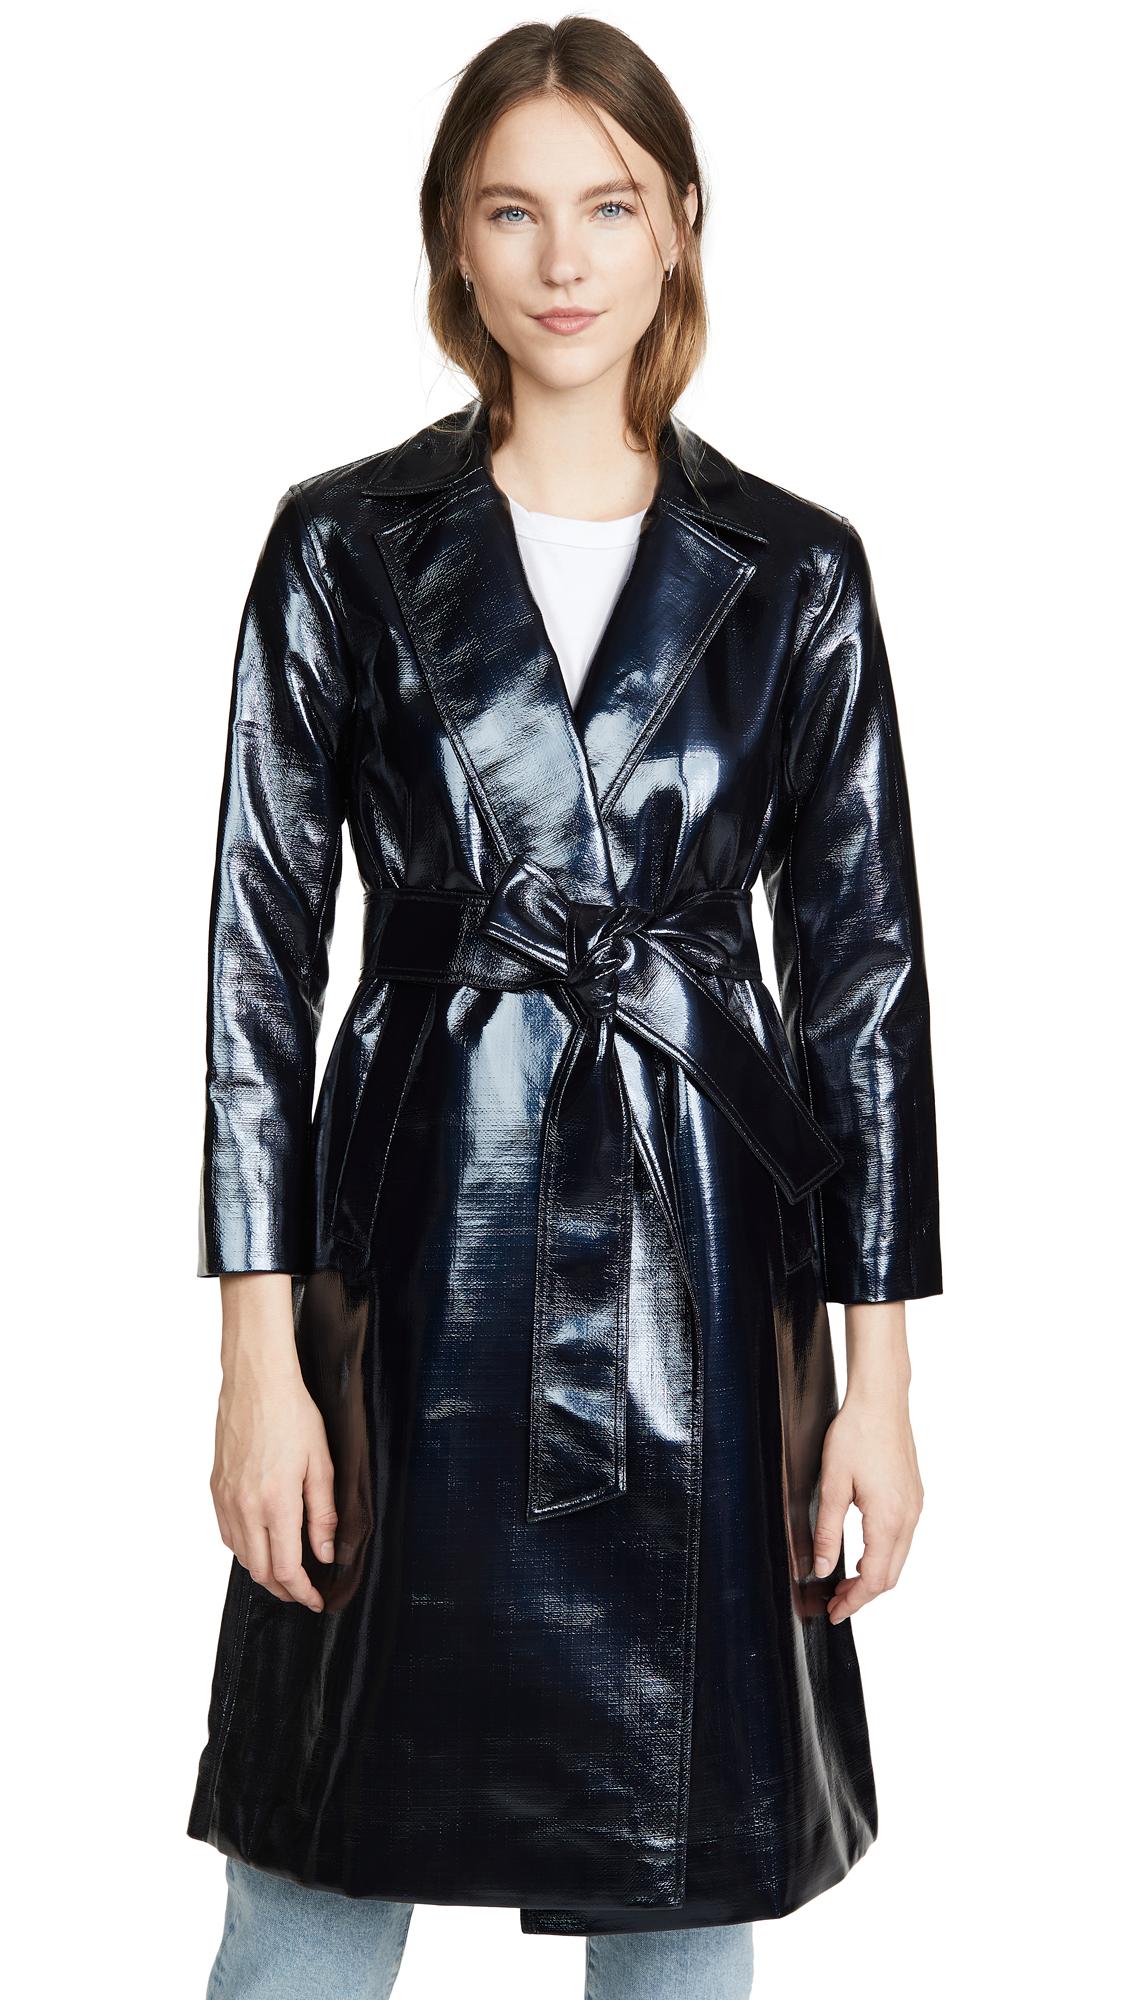 Buy Club Monaco Lacquer Coat online beautiful Club Monaco Jackets, Coats, Trench Coats